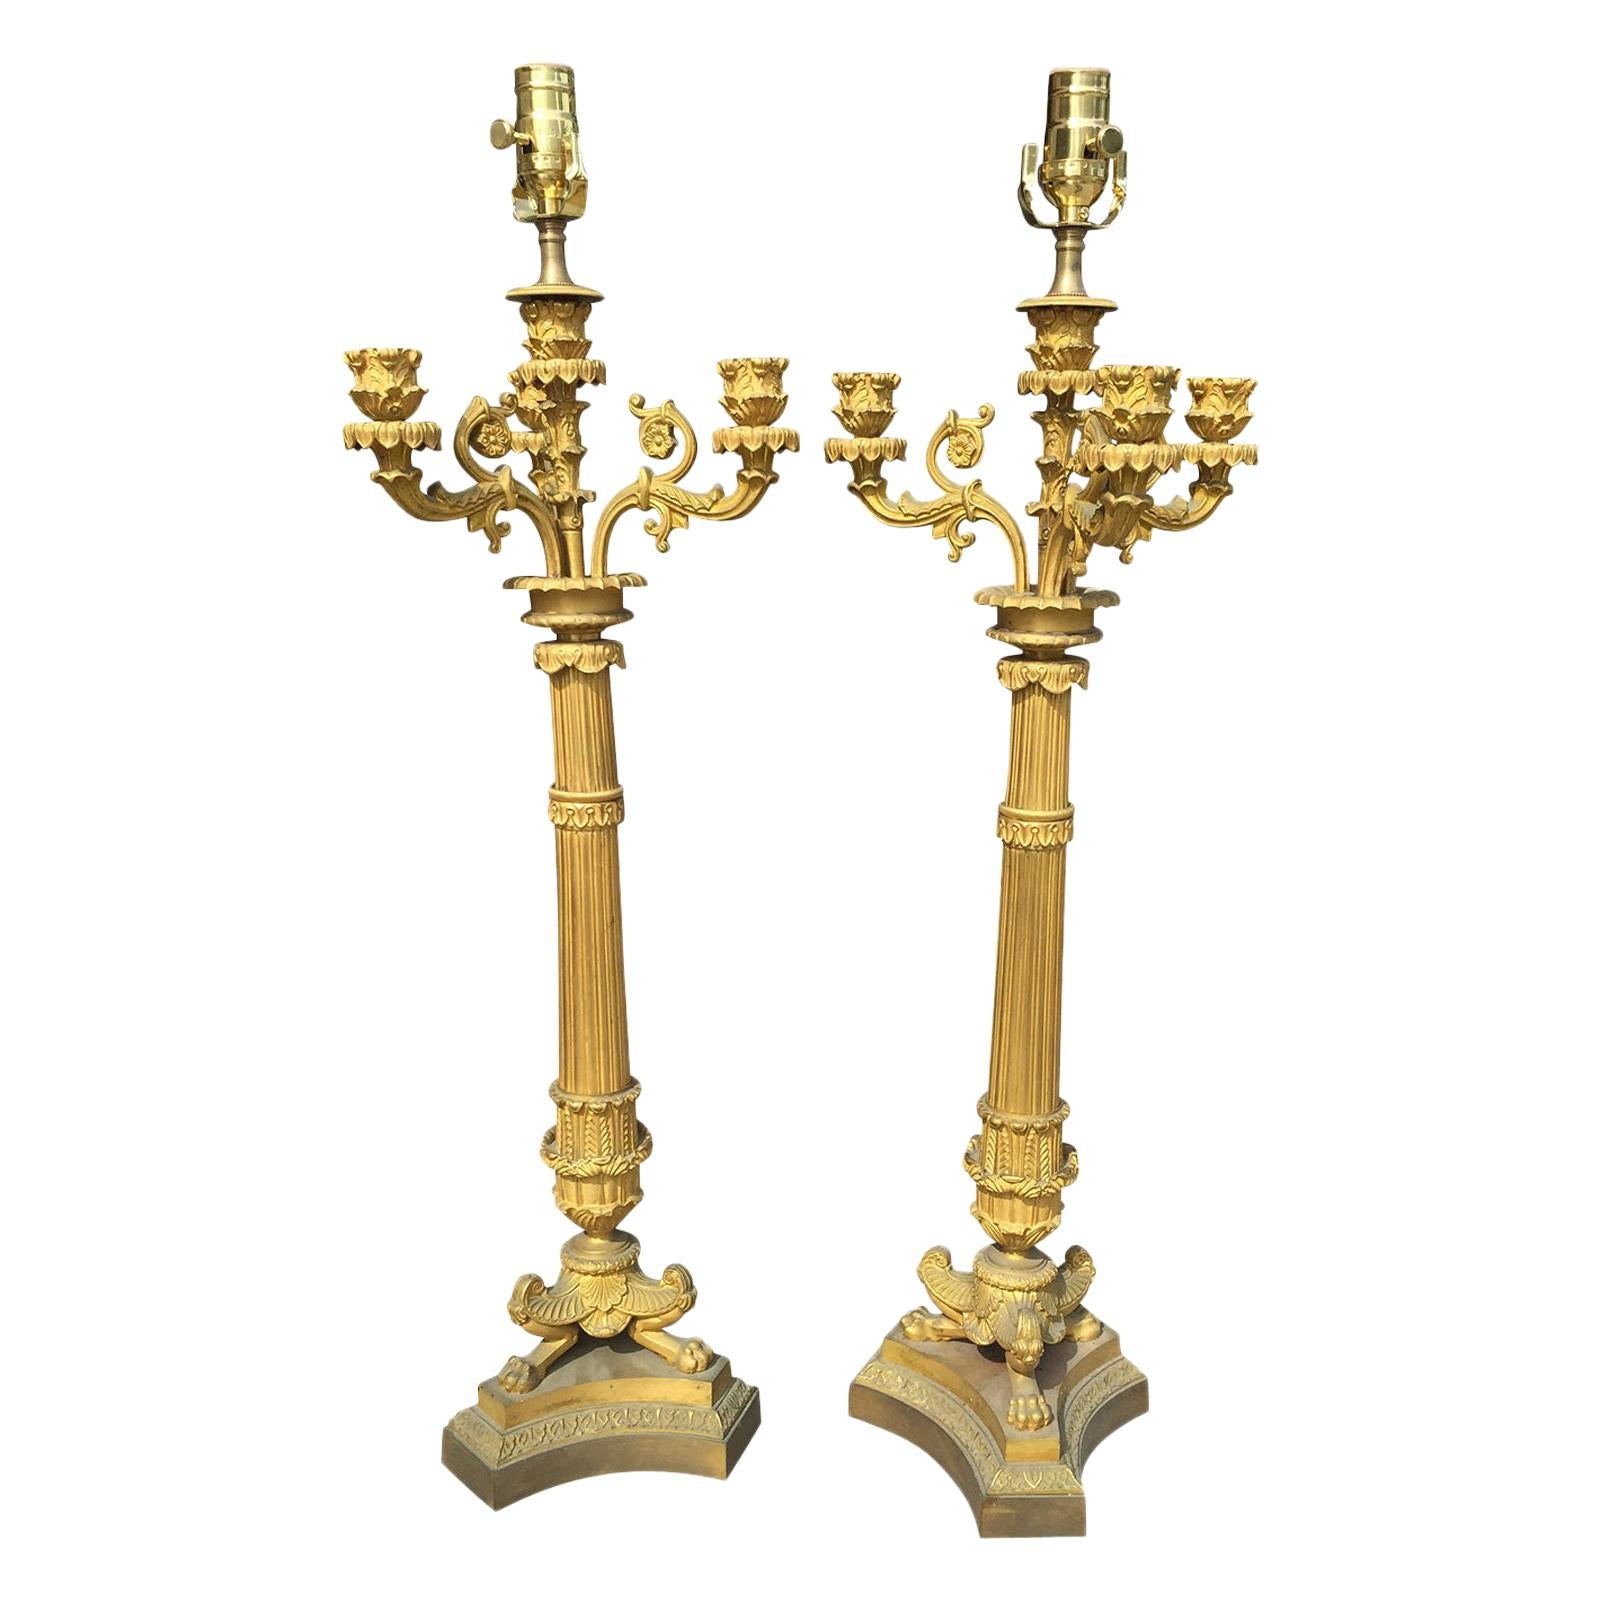 Pair of French Gilt Bronze Empire Candelabras as Lamps, circa 1810